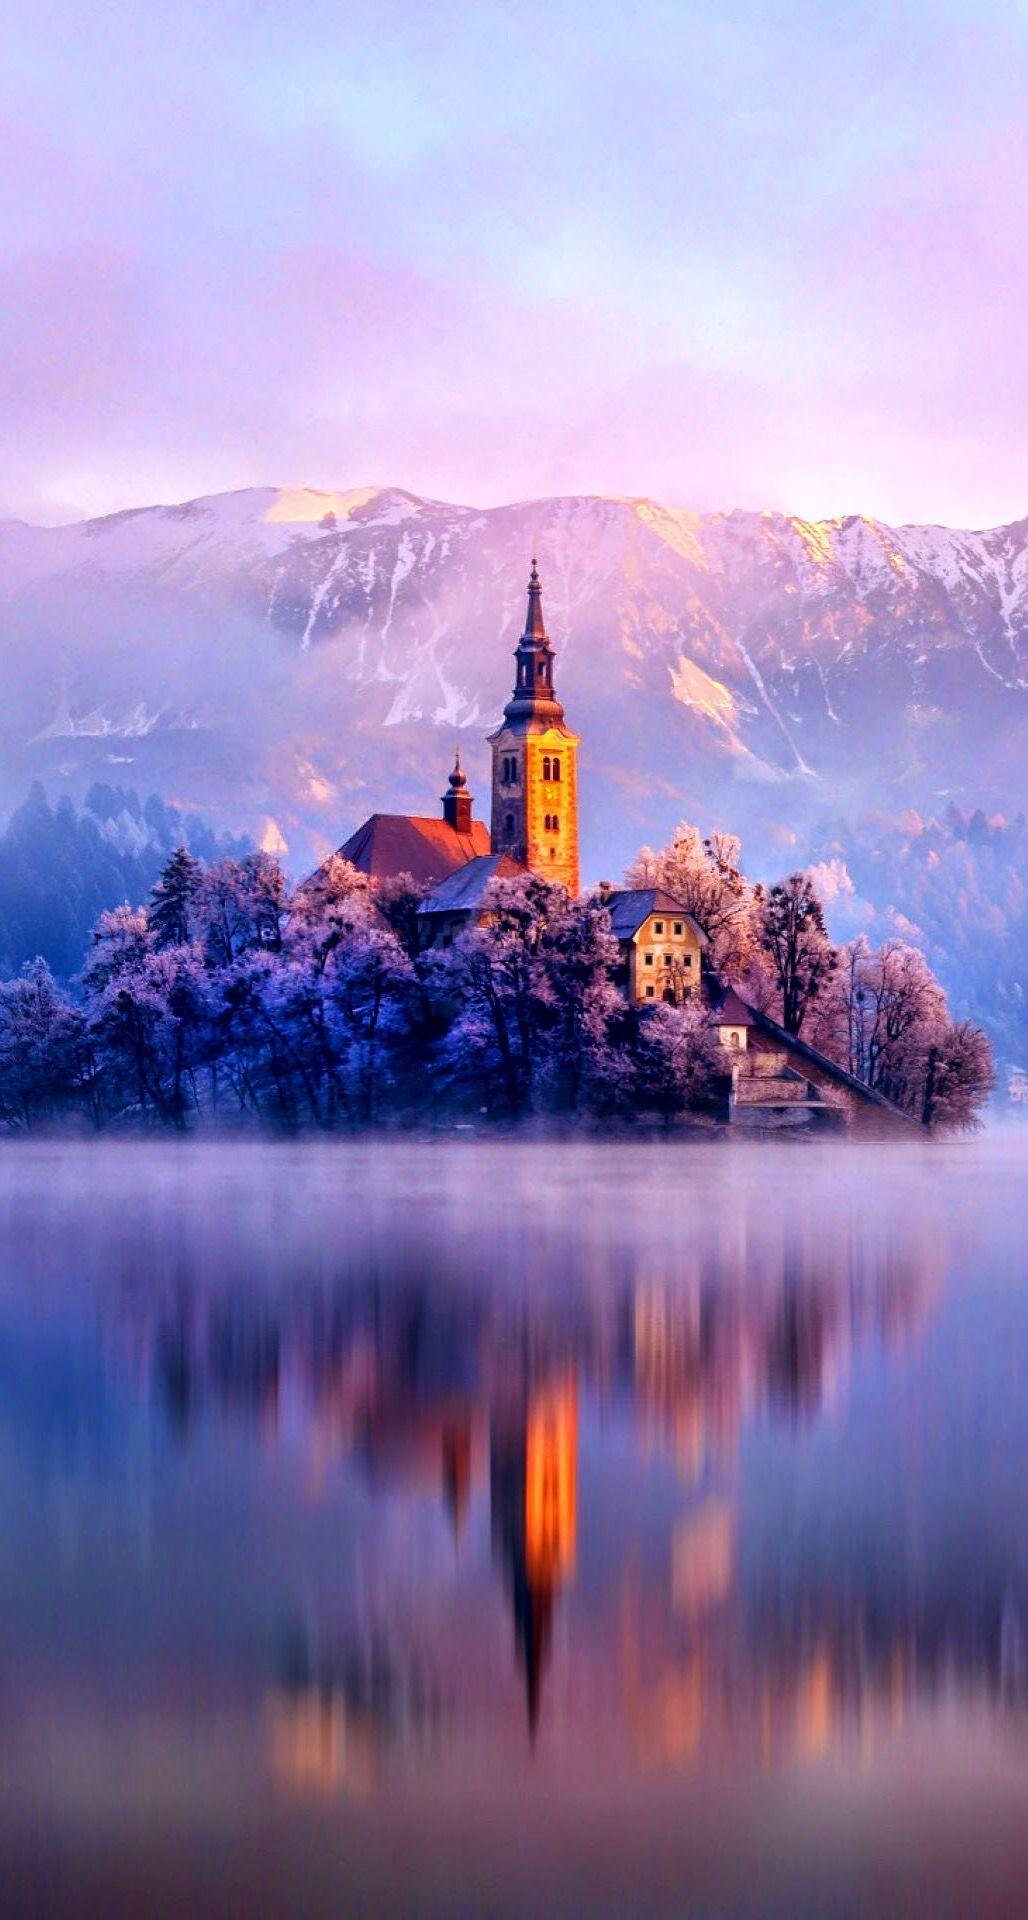 Wallpaper iphone winter - Lake Monastery Fortress Winter Iphone 6 Plus Hd Wallpaper